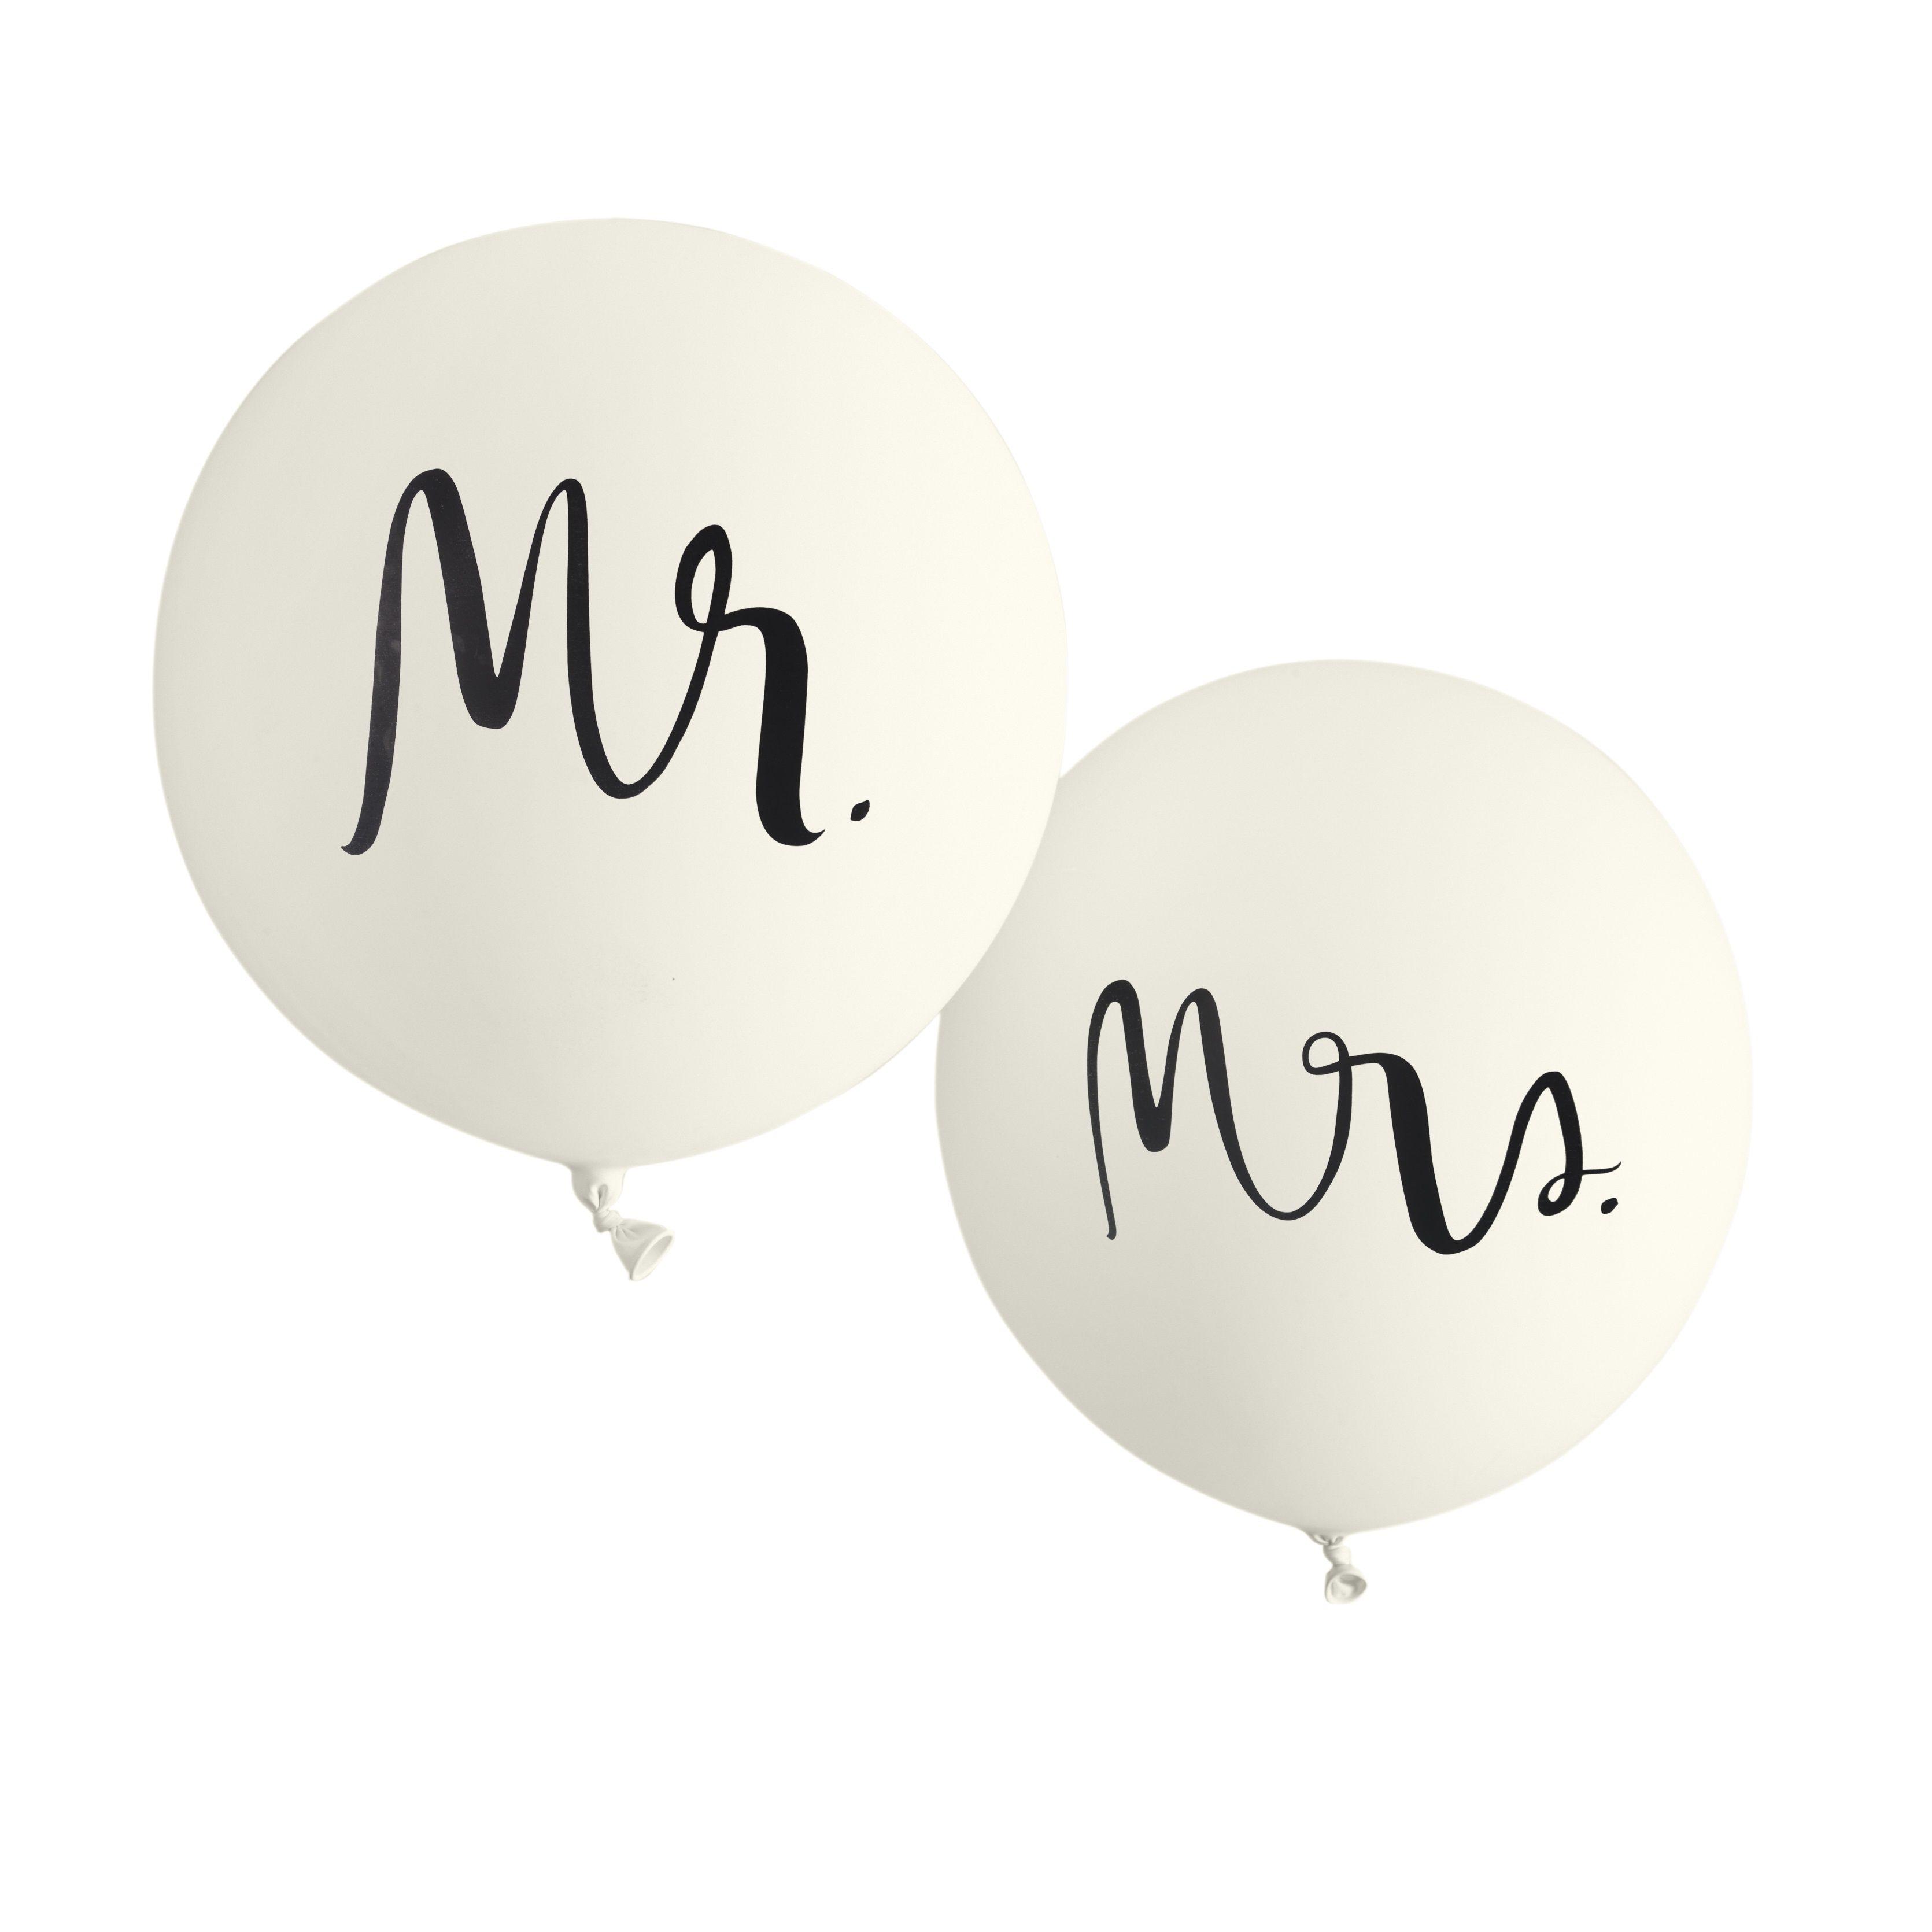 9dfddf8d0ba Kate Spade New York Mr. and Mrs. giant wedding balloons | Bridal ...